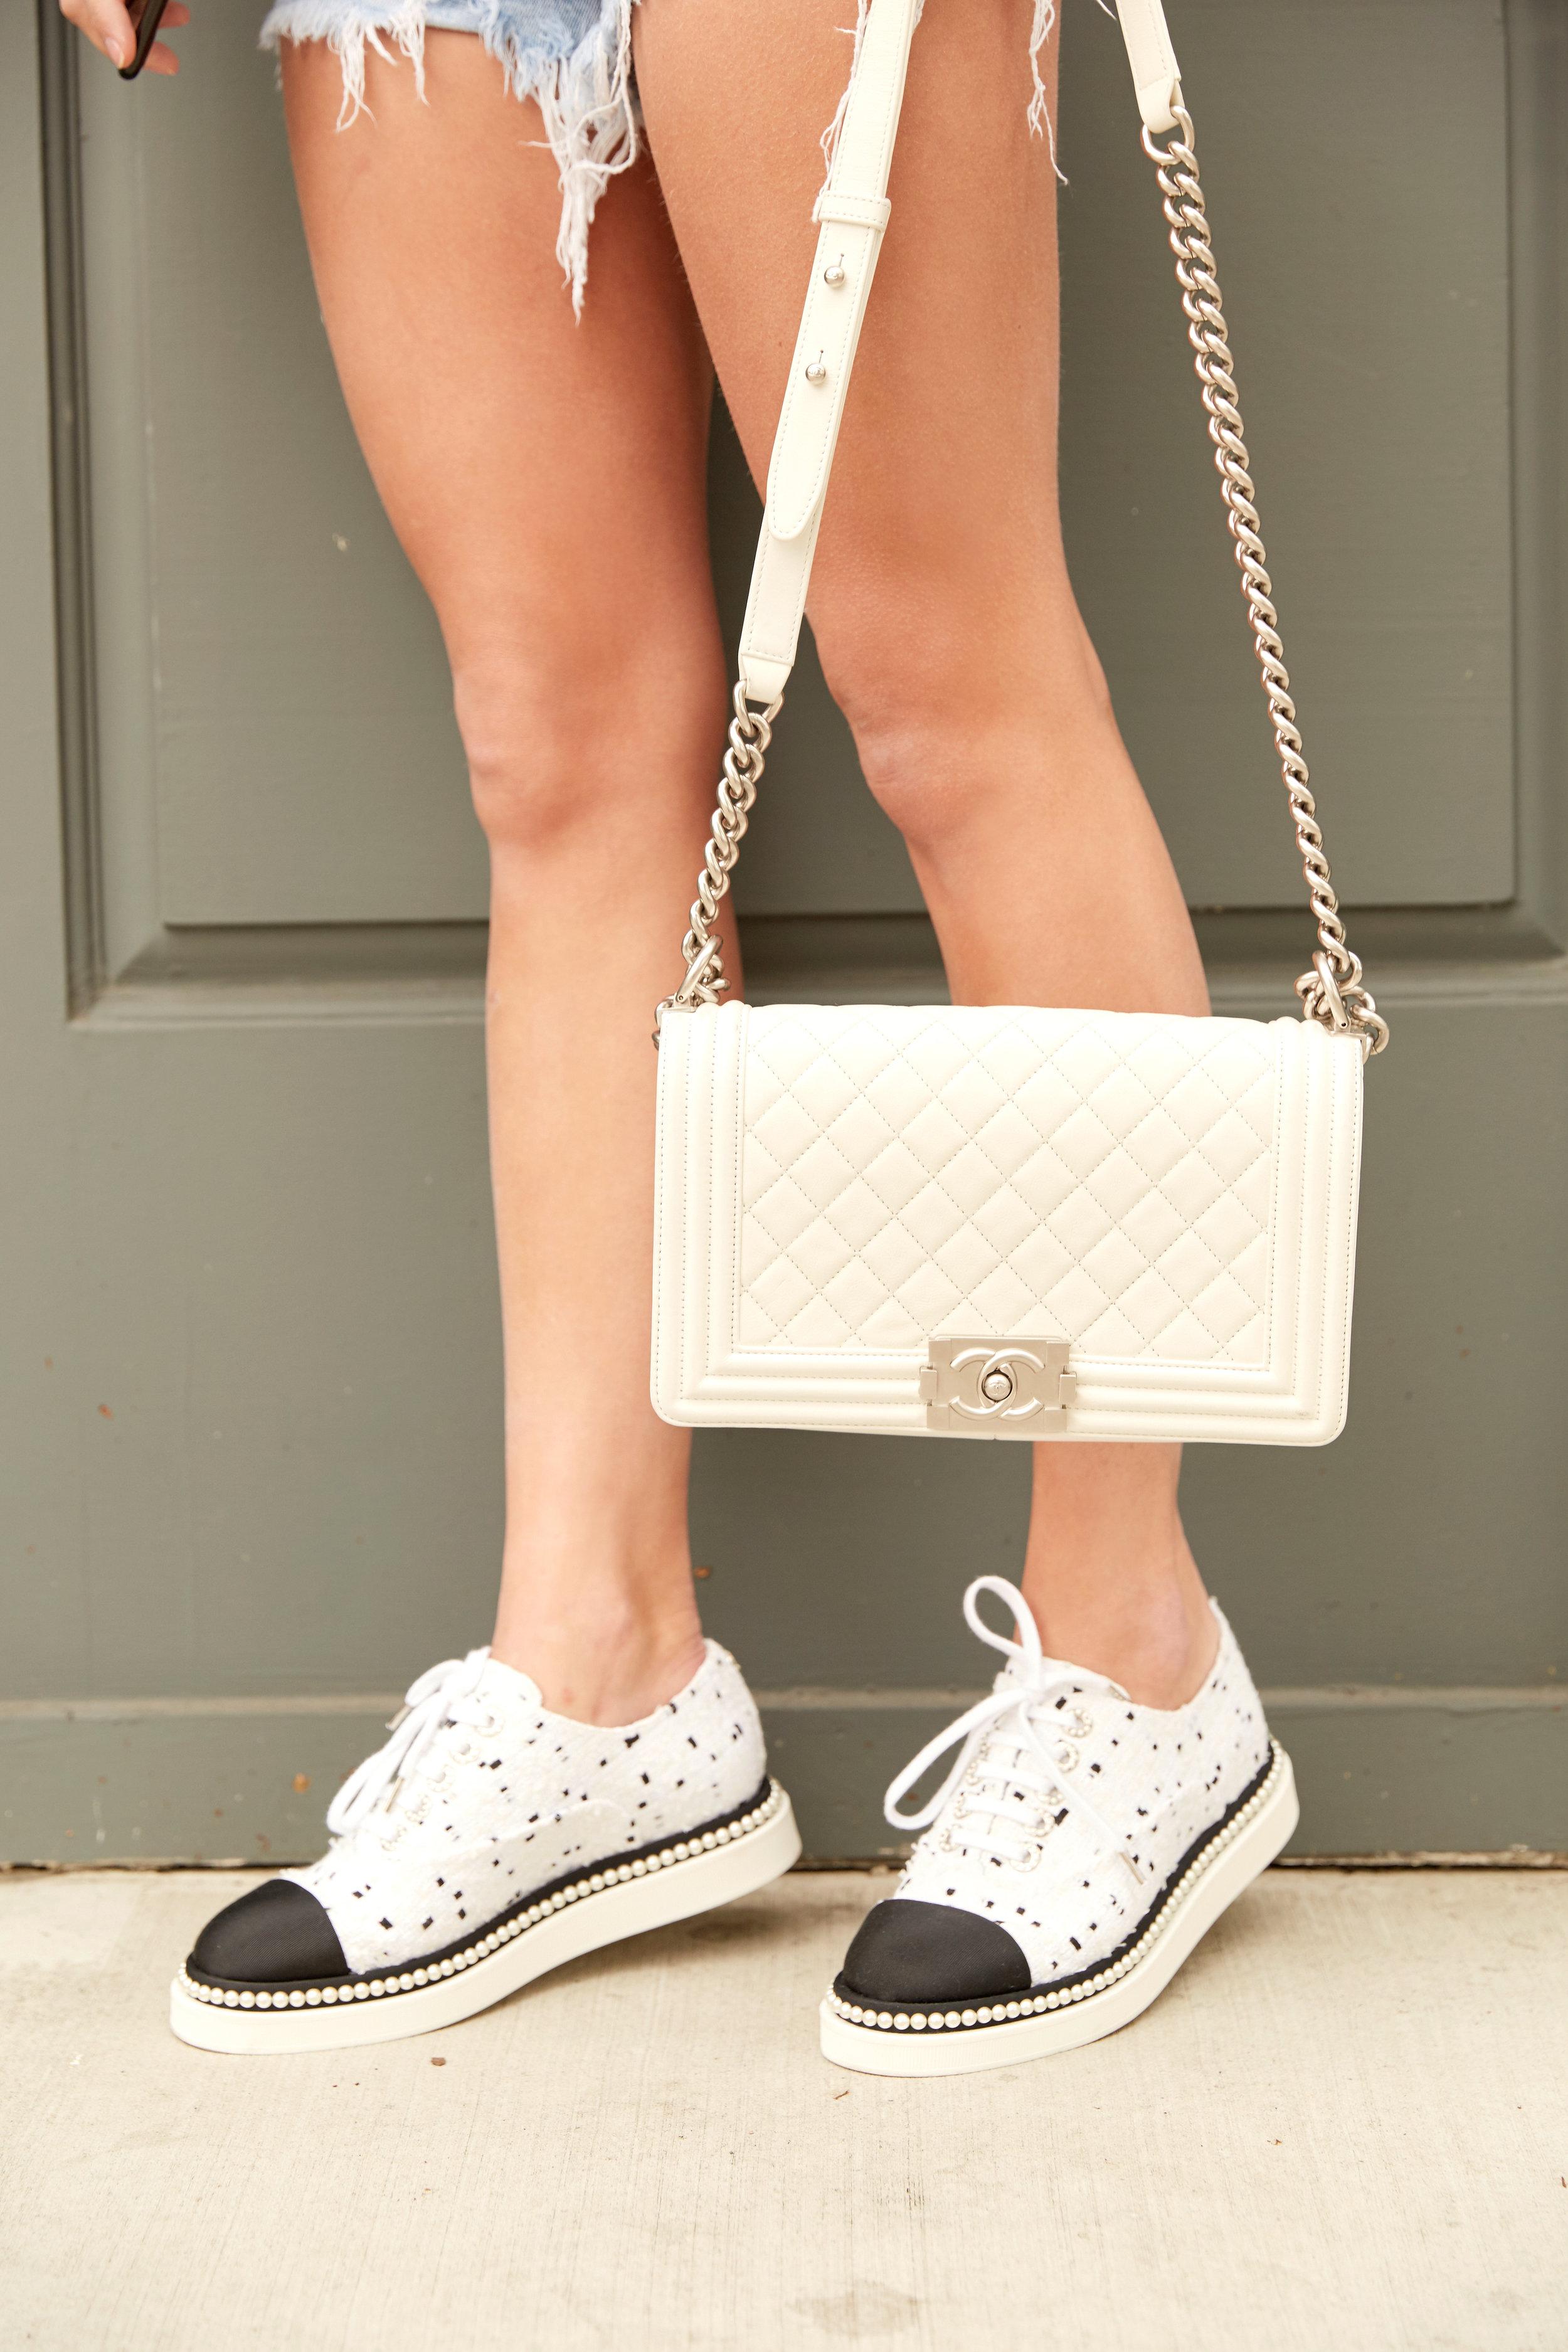 Purse & sneakers